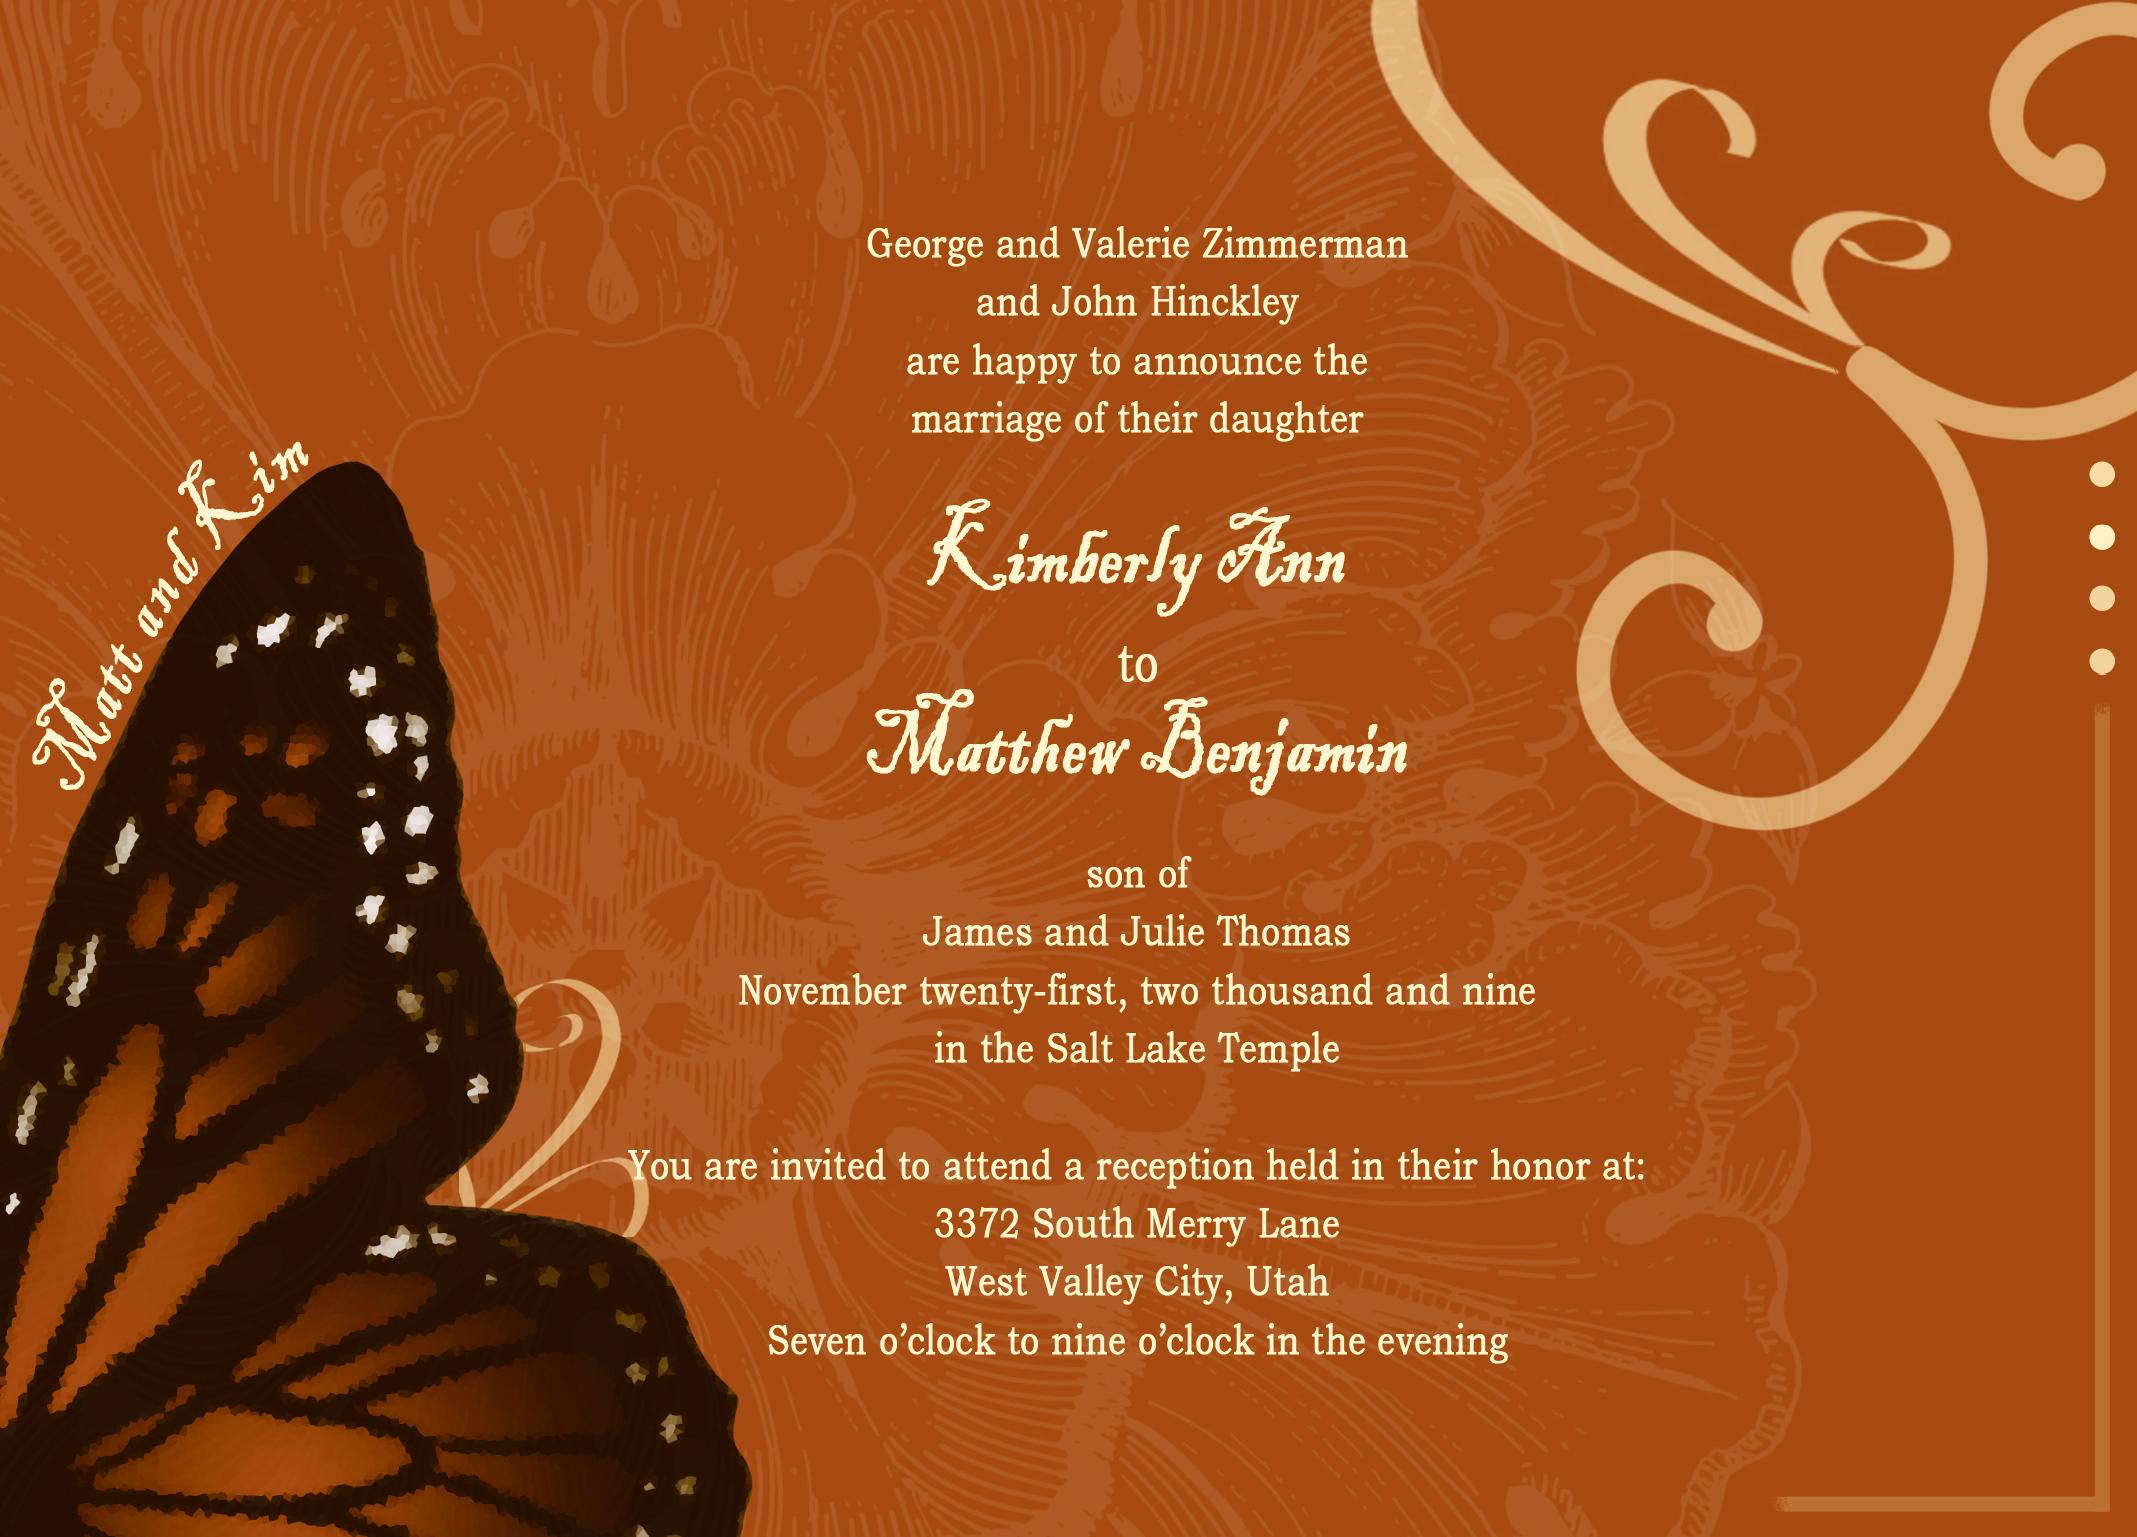 wedding invitations wedding card invitation wedding cards design